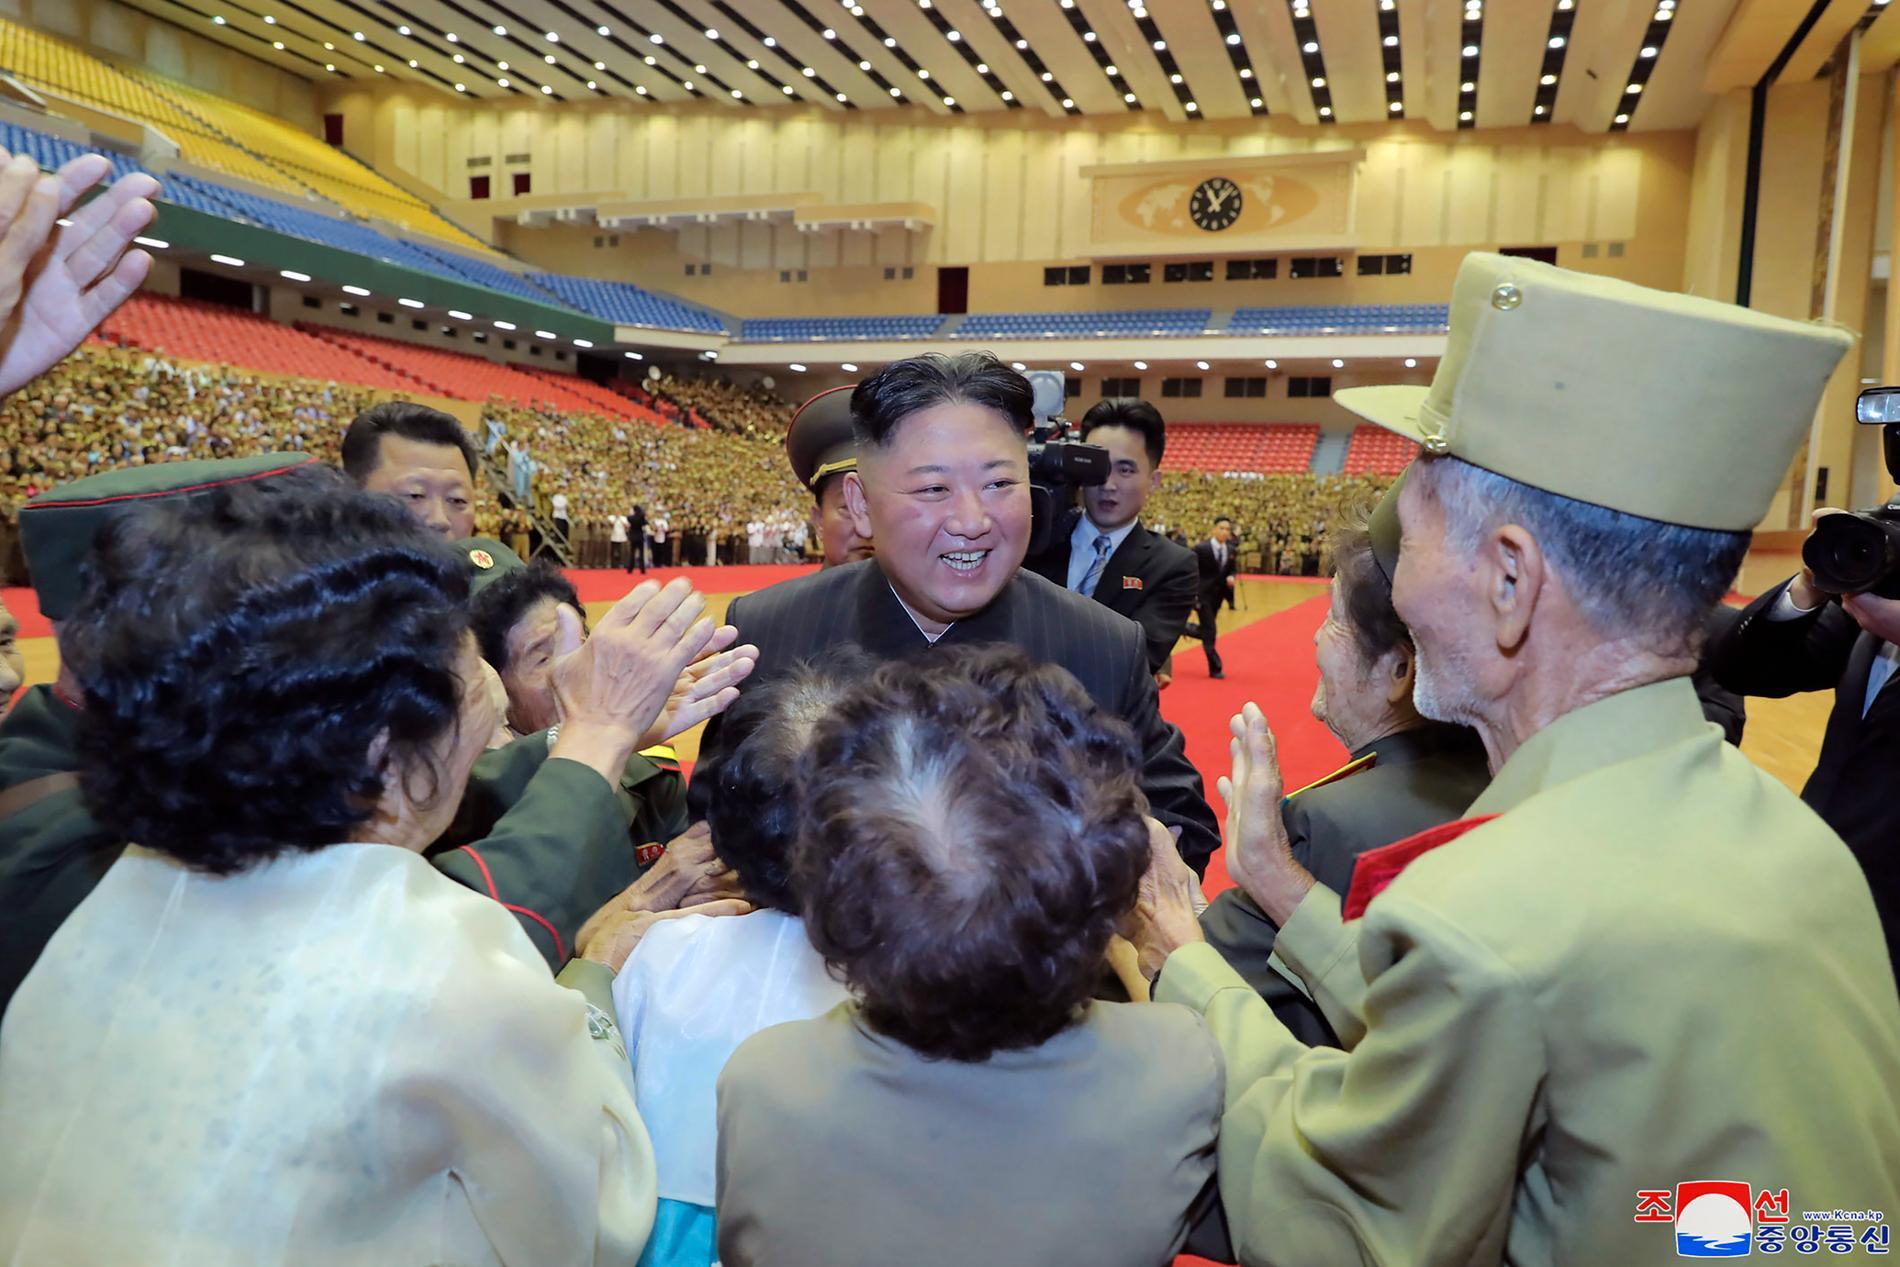 Nordkoreas ledare Kim Jong-Un under en veterankonferens i huvudstaden Pyongyang den 29 juli.